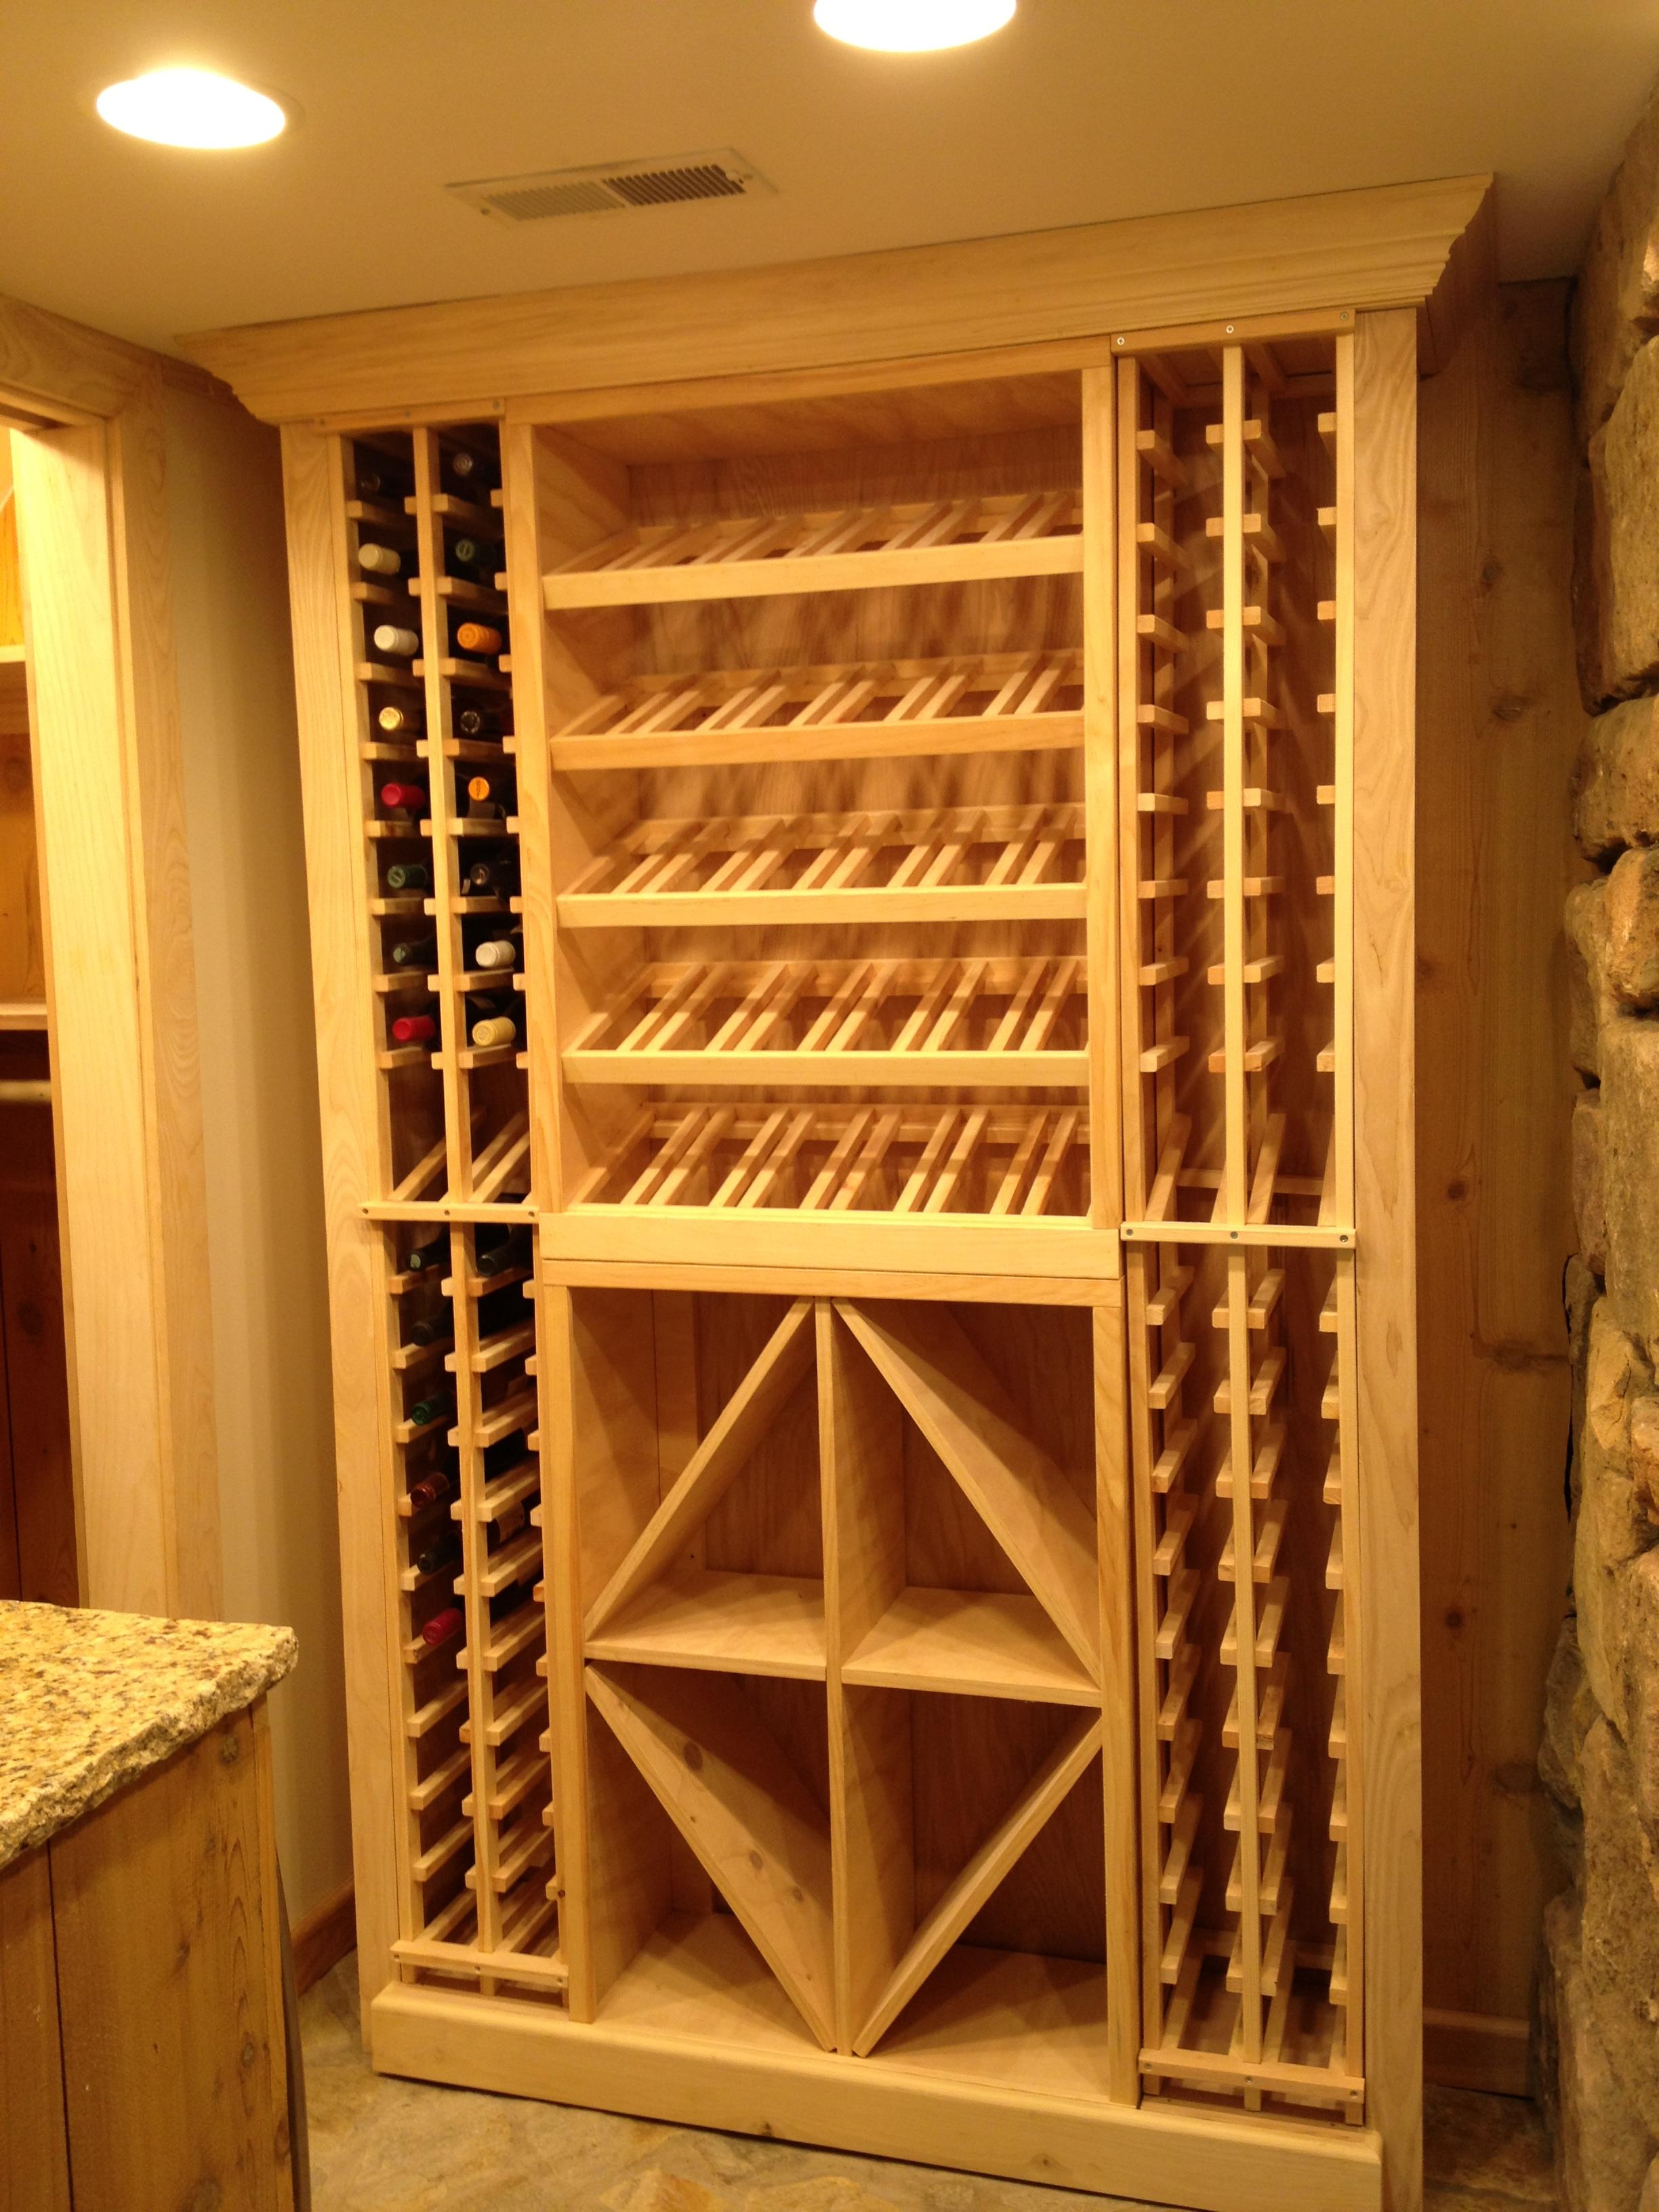 Wine cellar designs for small spaces wine cellar racks - Wine cellar designs for small spaces ...